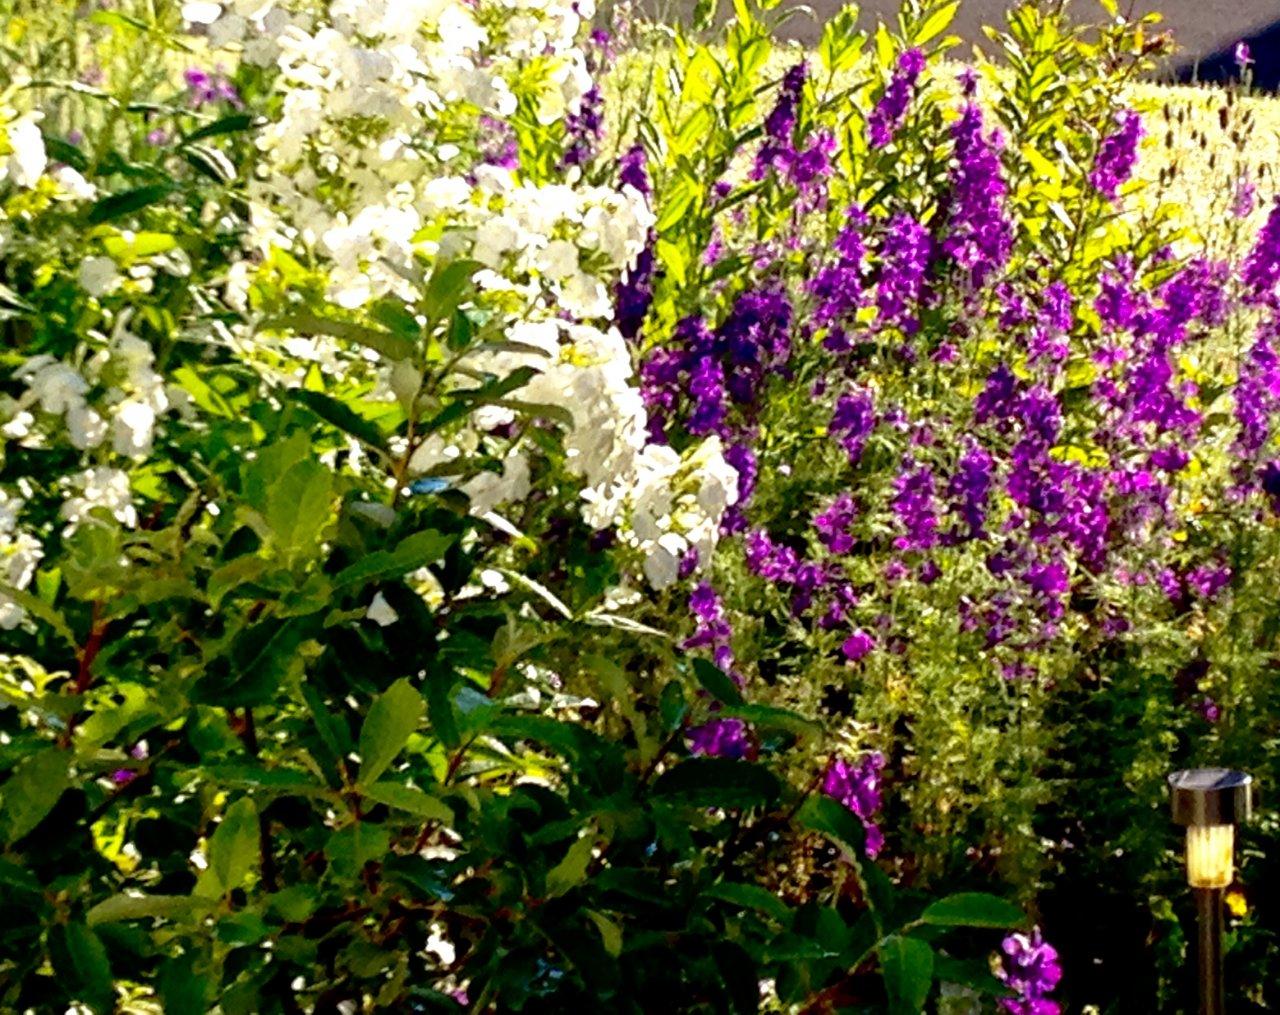 Purple Flowers On Tall Fern Like Plant Flowers Forums